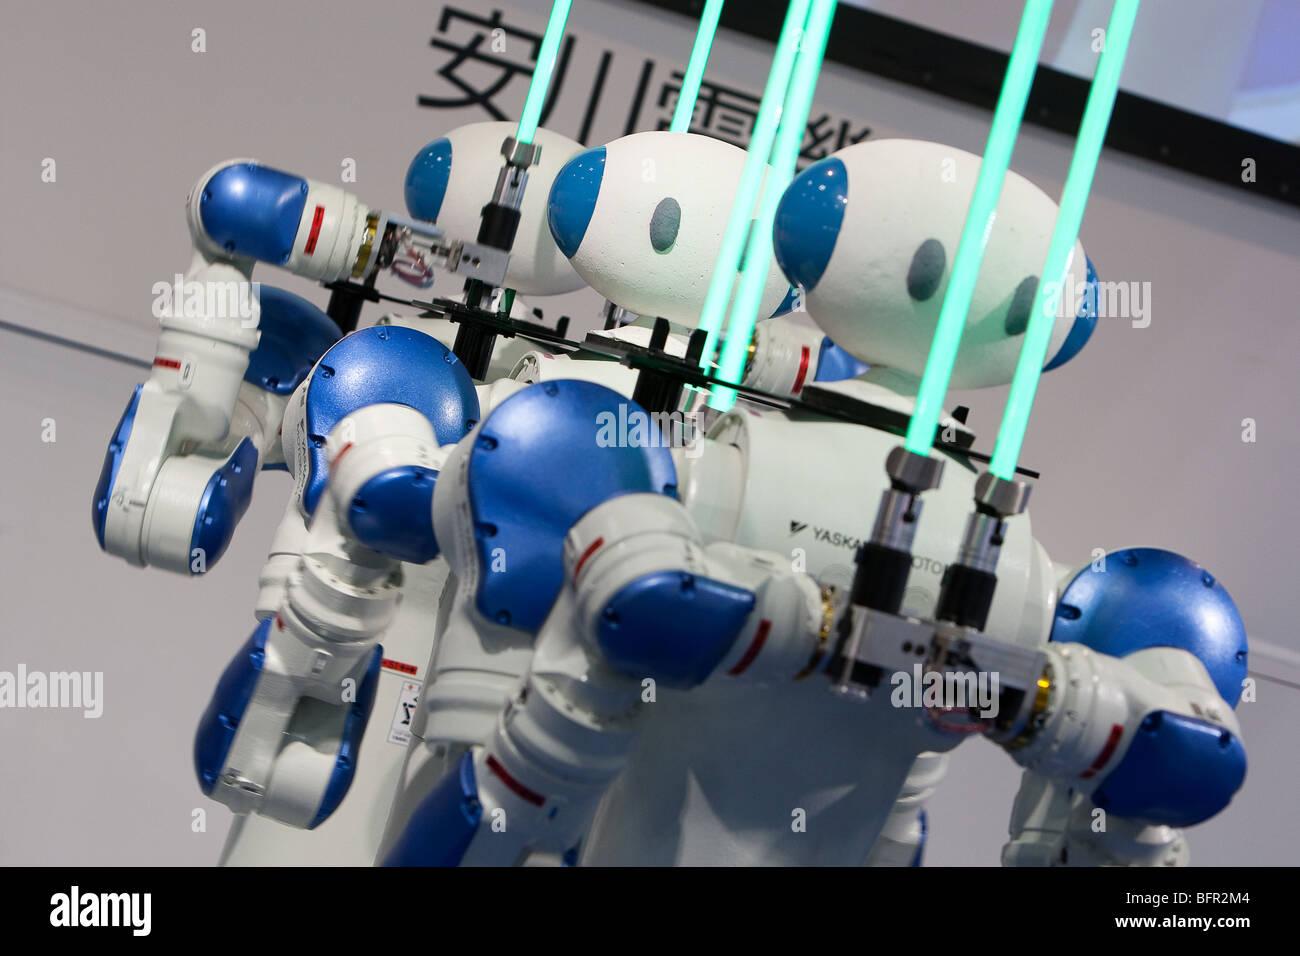 Motoman Robots Produced By Yaskawa Company International Robot